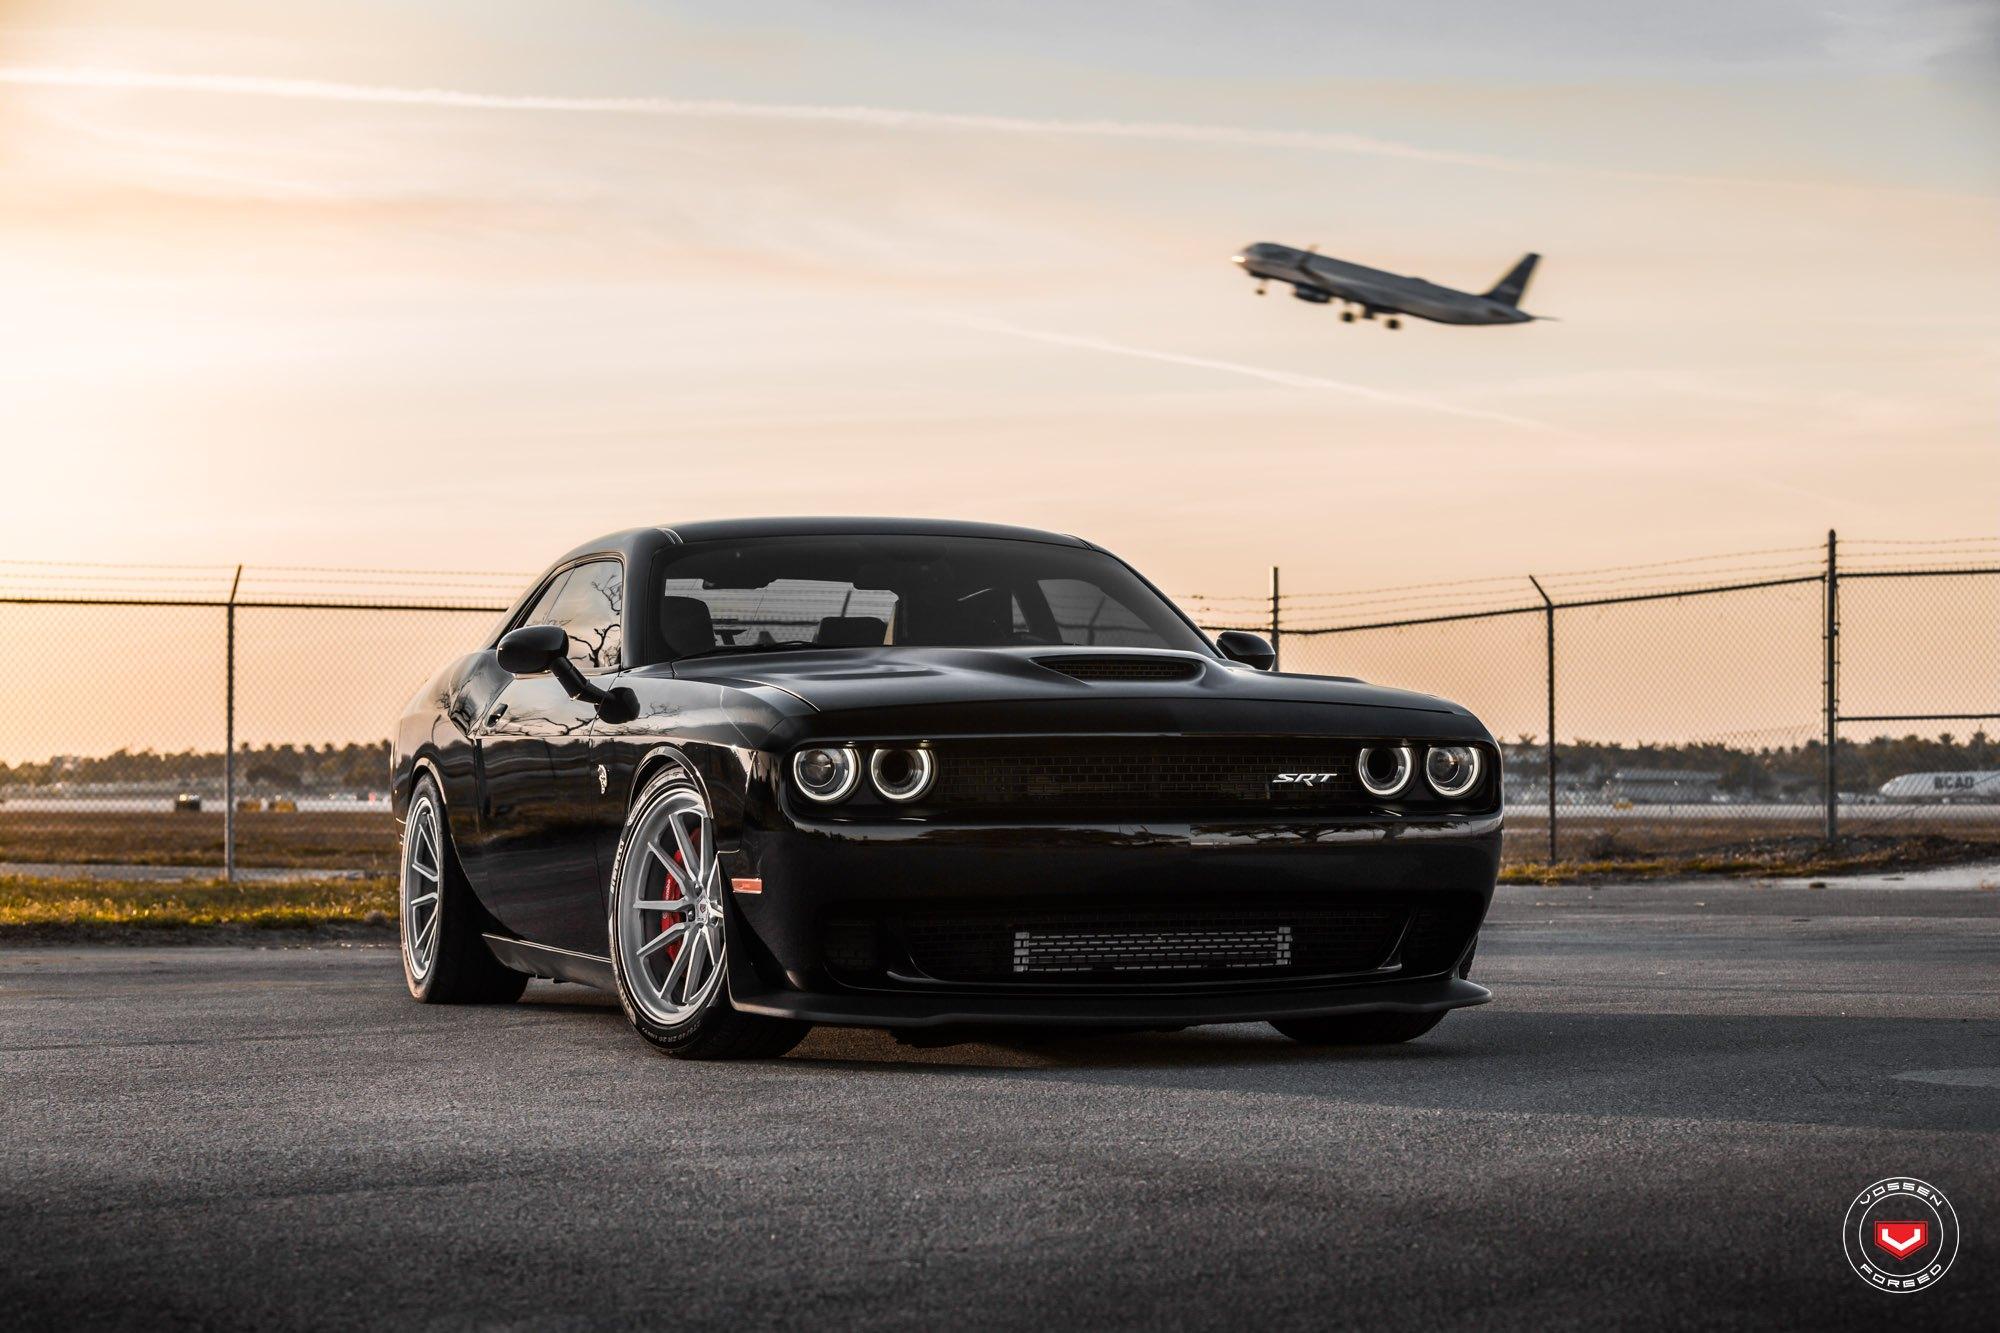 Beast Mode On Black Dodge Challenger Srt With Halo Lights Carid Com Gallery